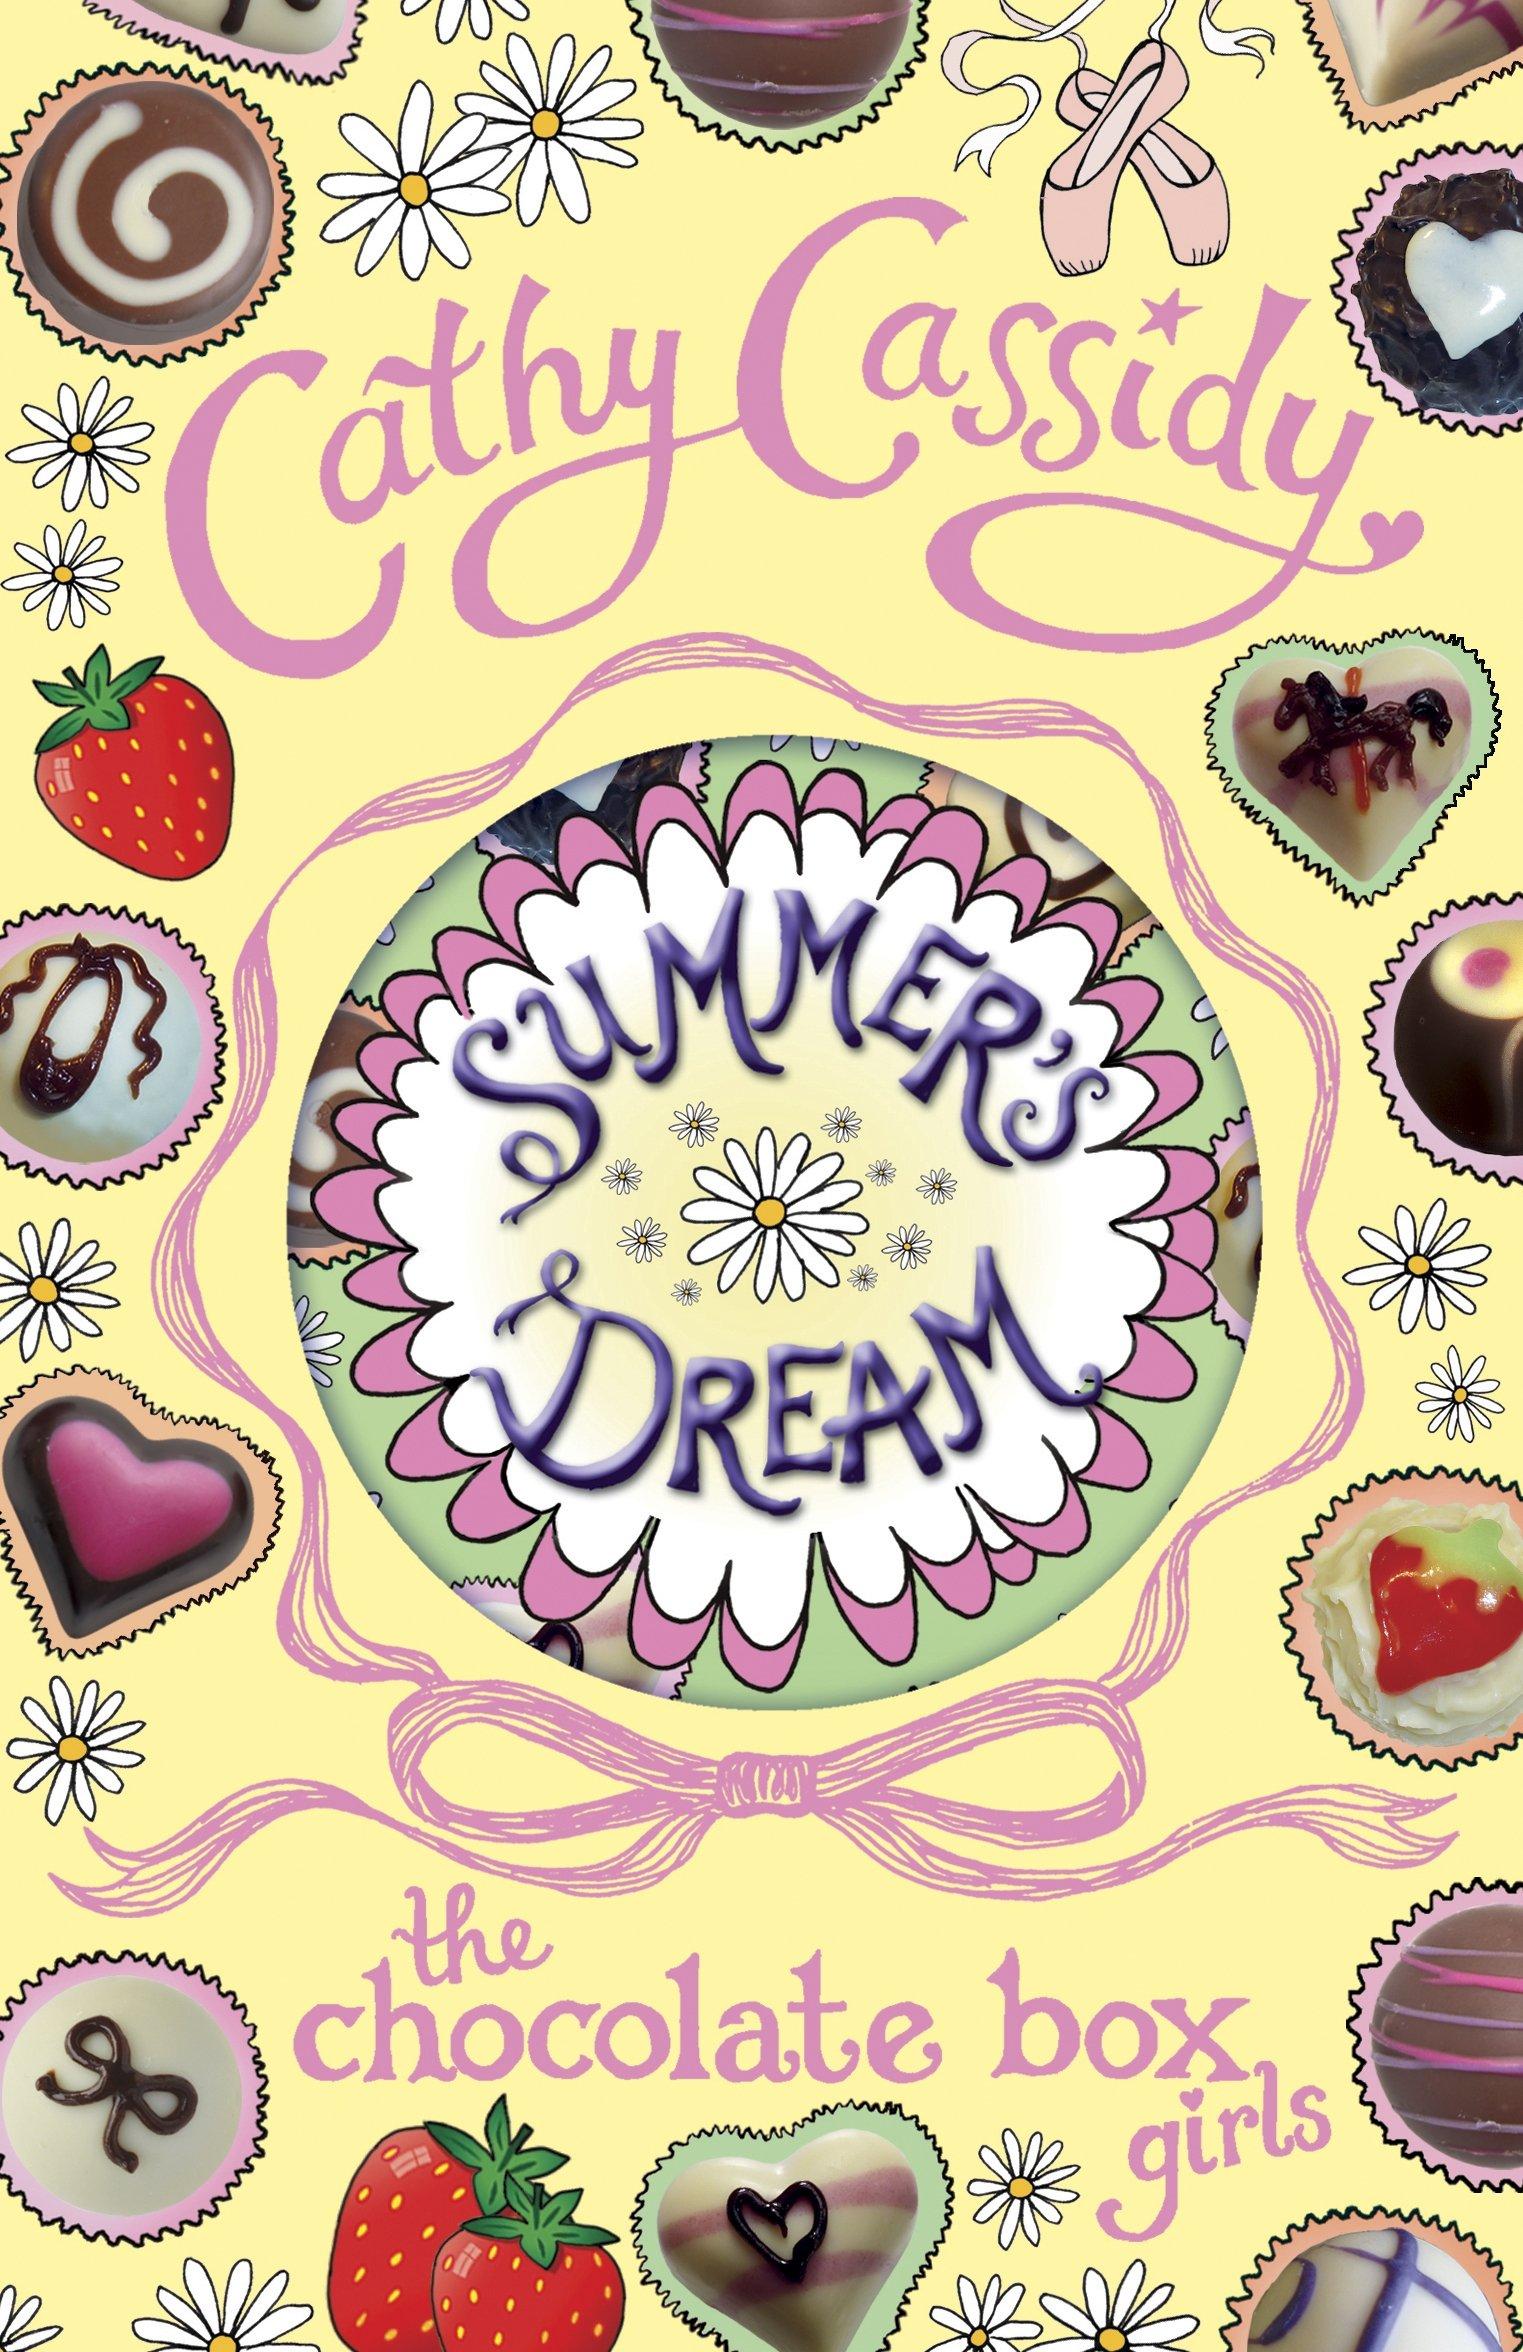 Chocolate Box Girls Summer's Dream: Cathy Cassidy: 9780141345888 ...